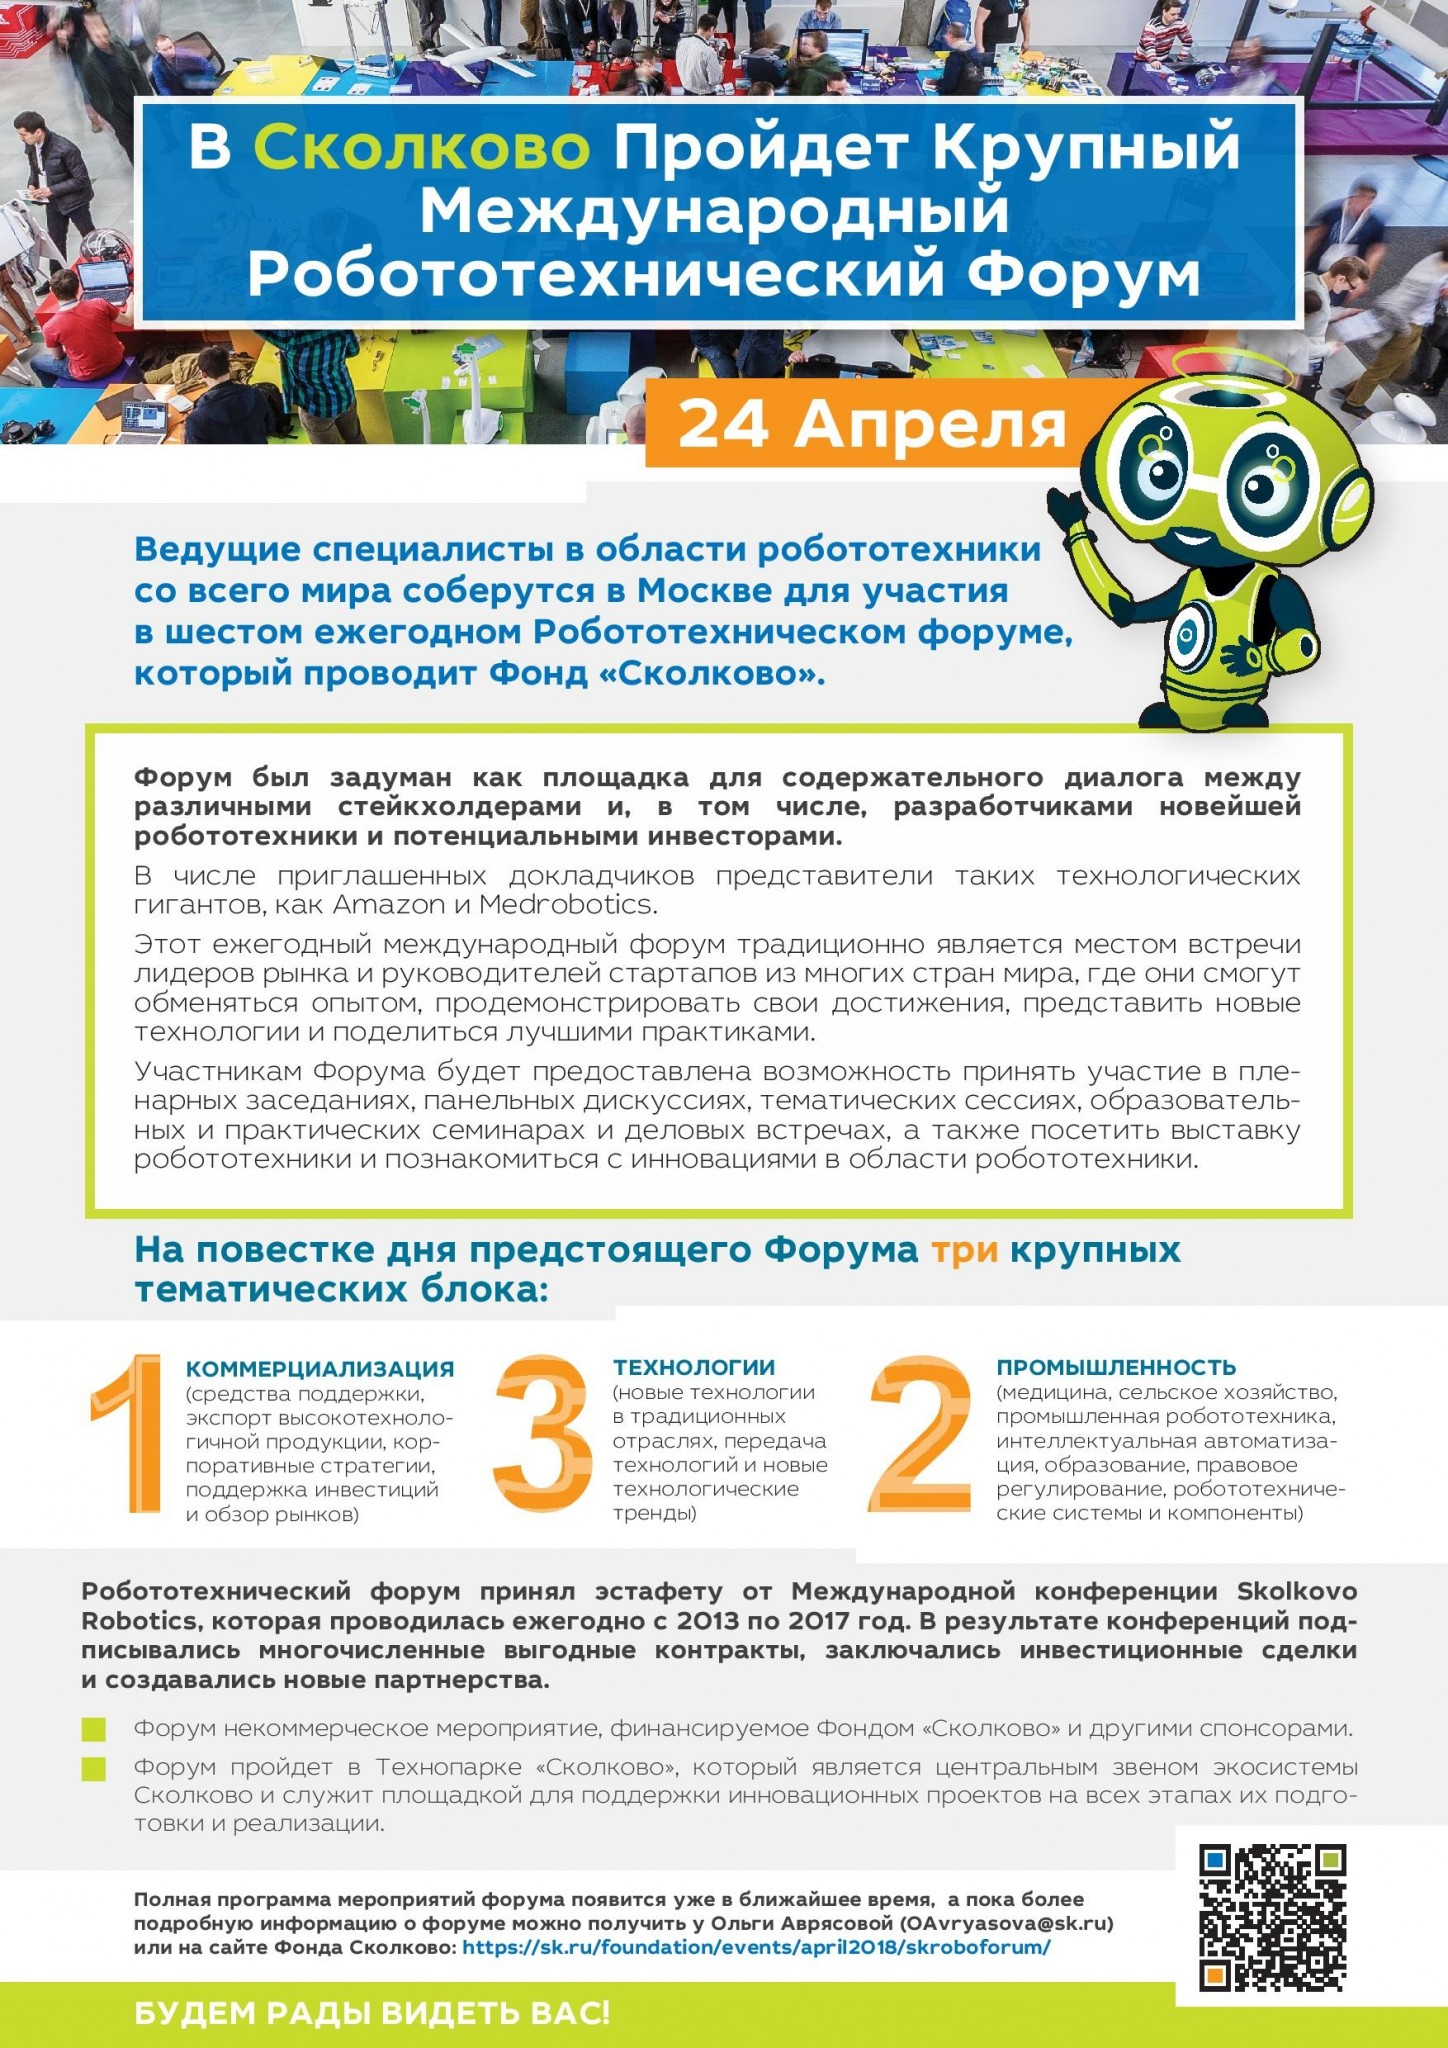 skolkovo-robo-conference-ru-page-001-1-ib